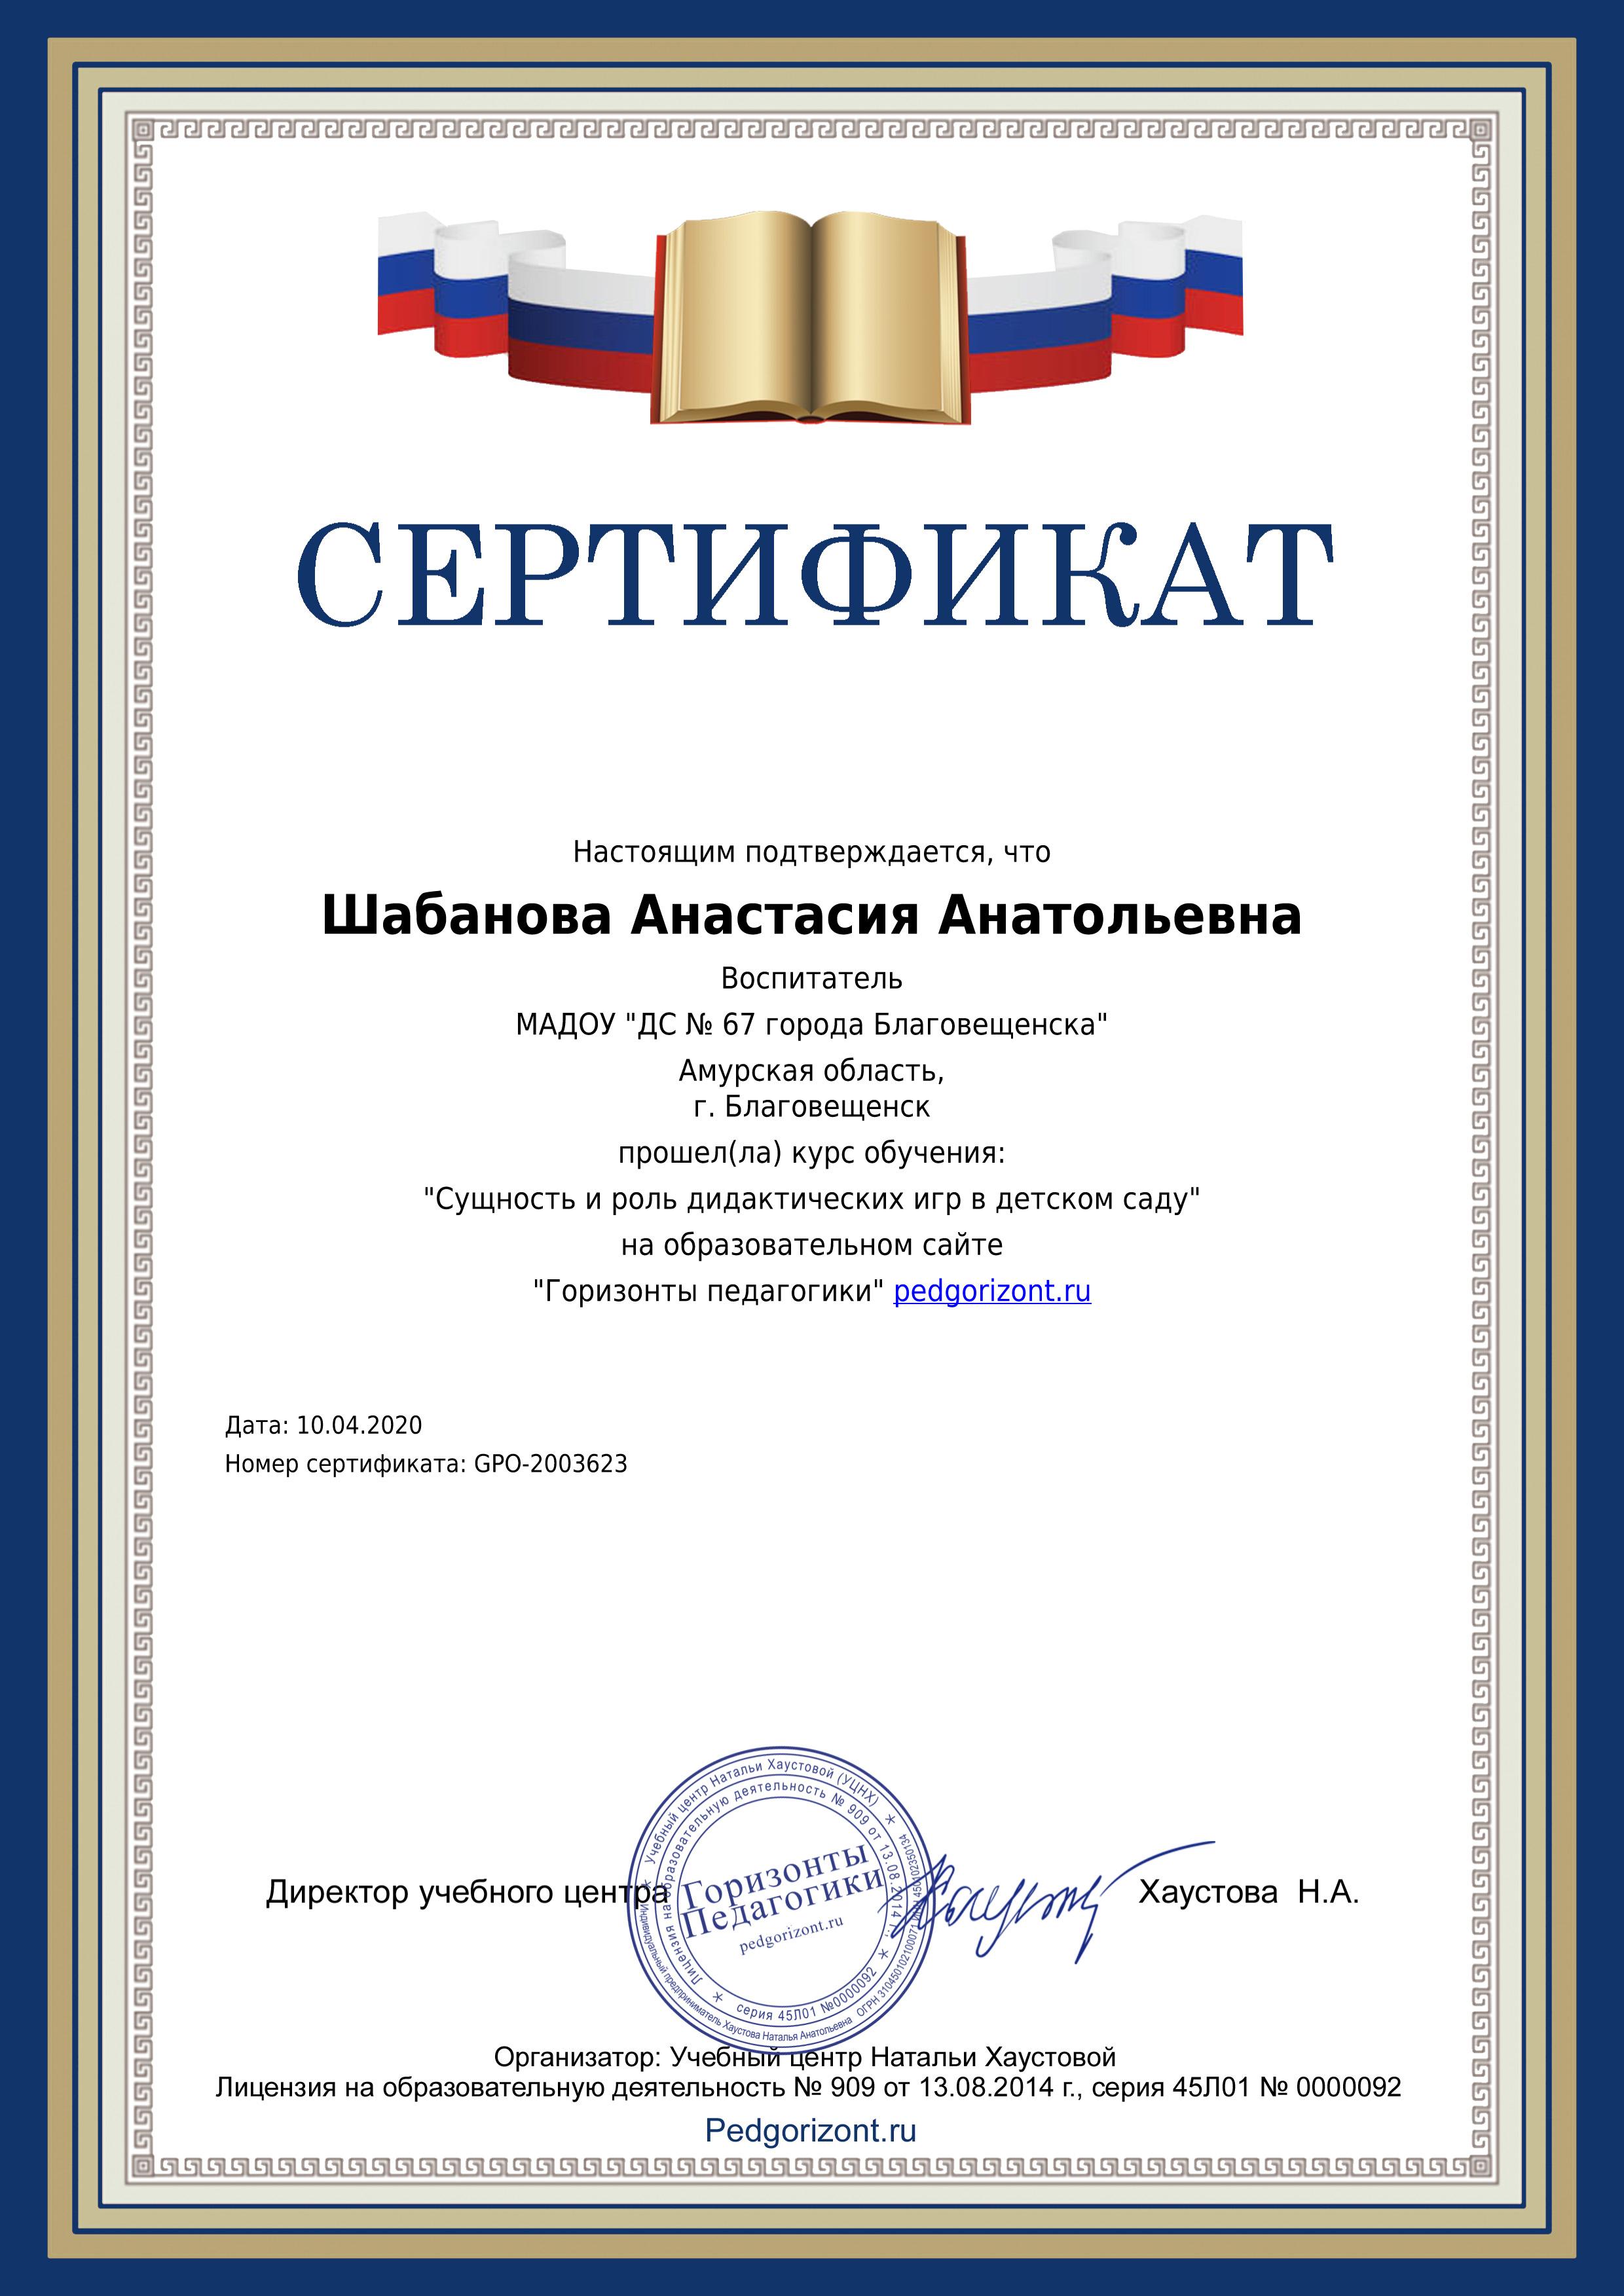 diplom_author_2003623